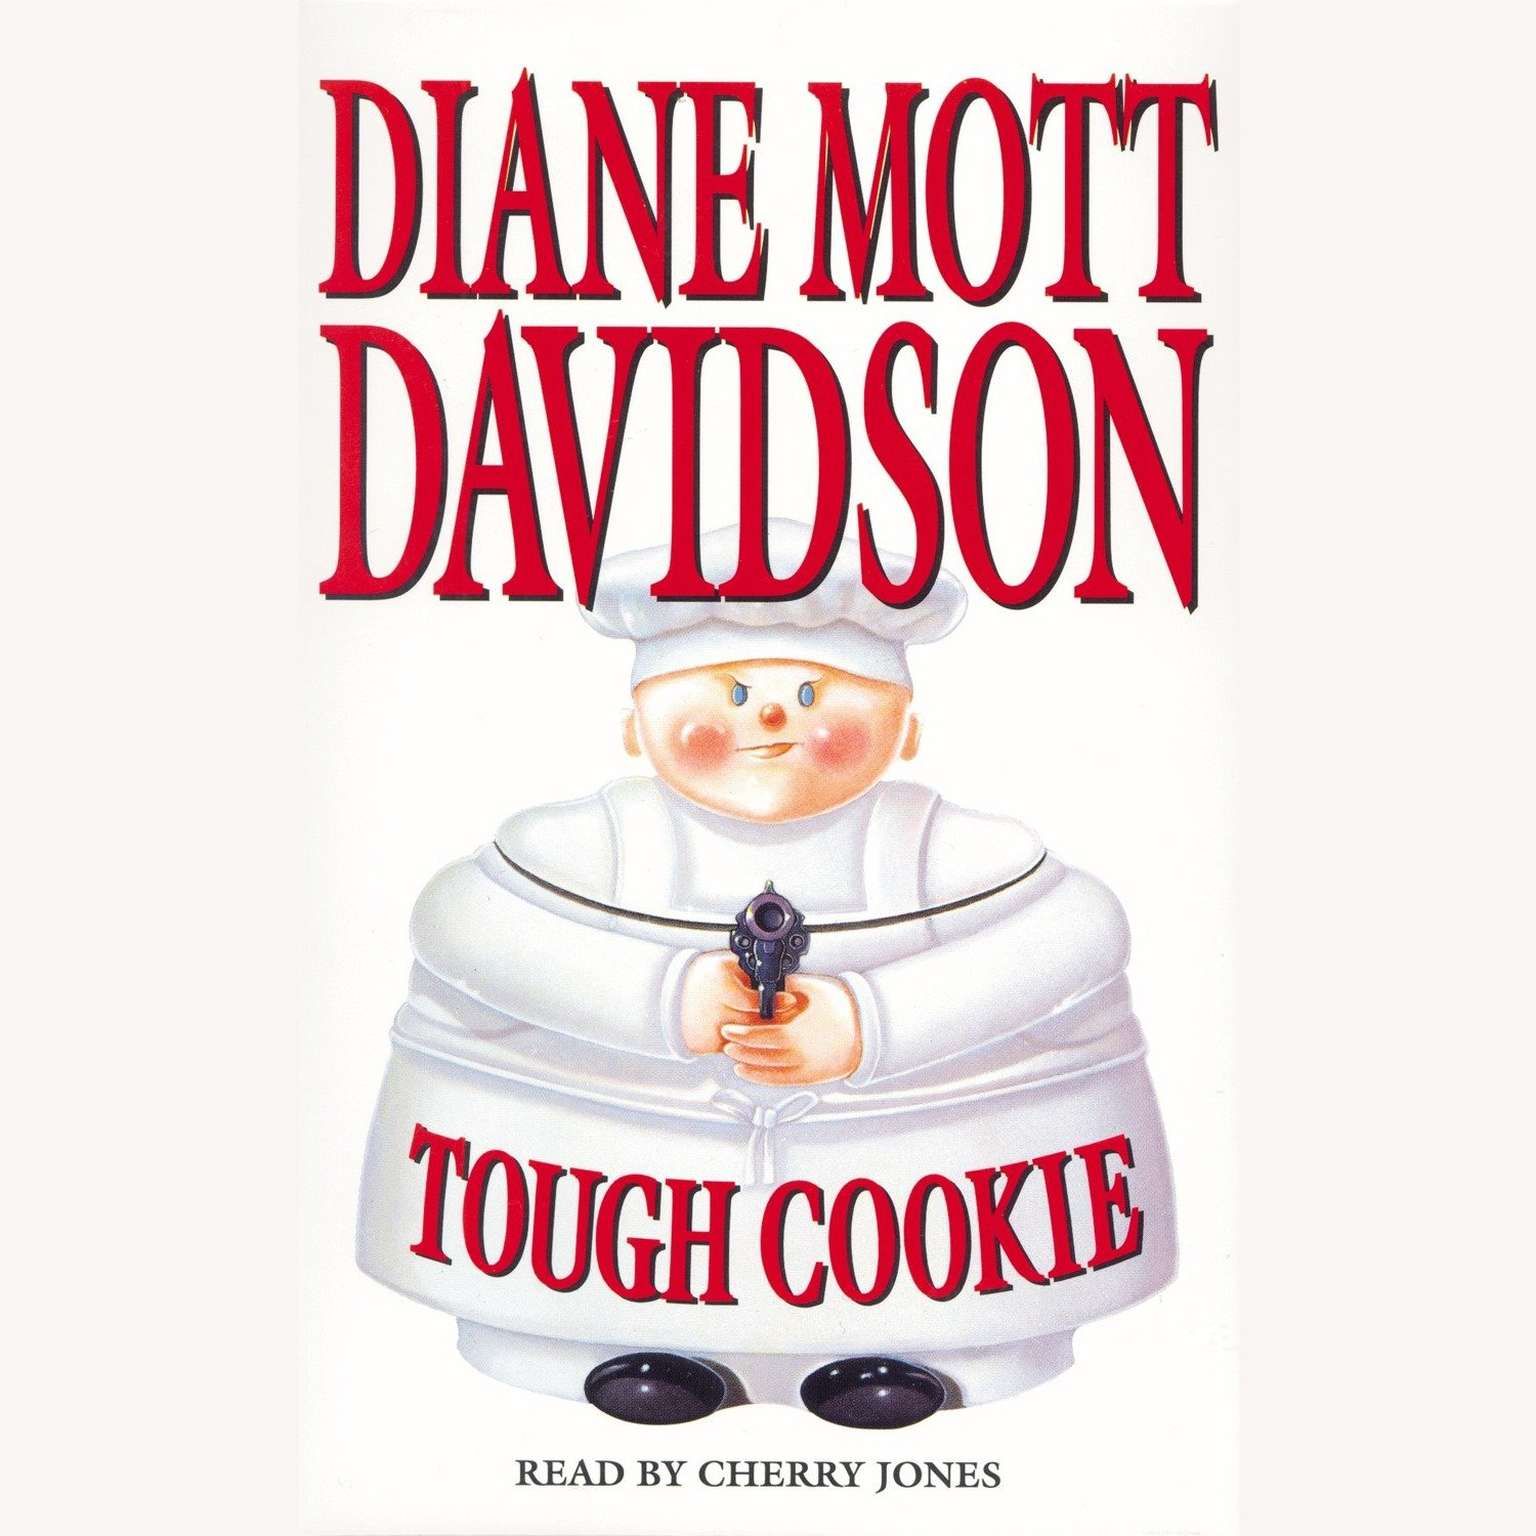 Tough Cookie (Abridged) Audiobook, by Diane Mott Davidson